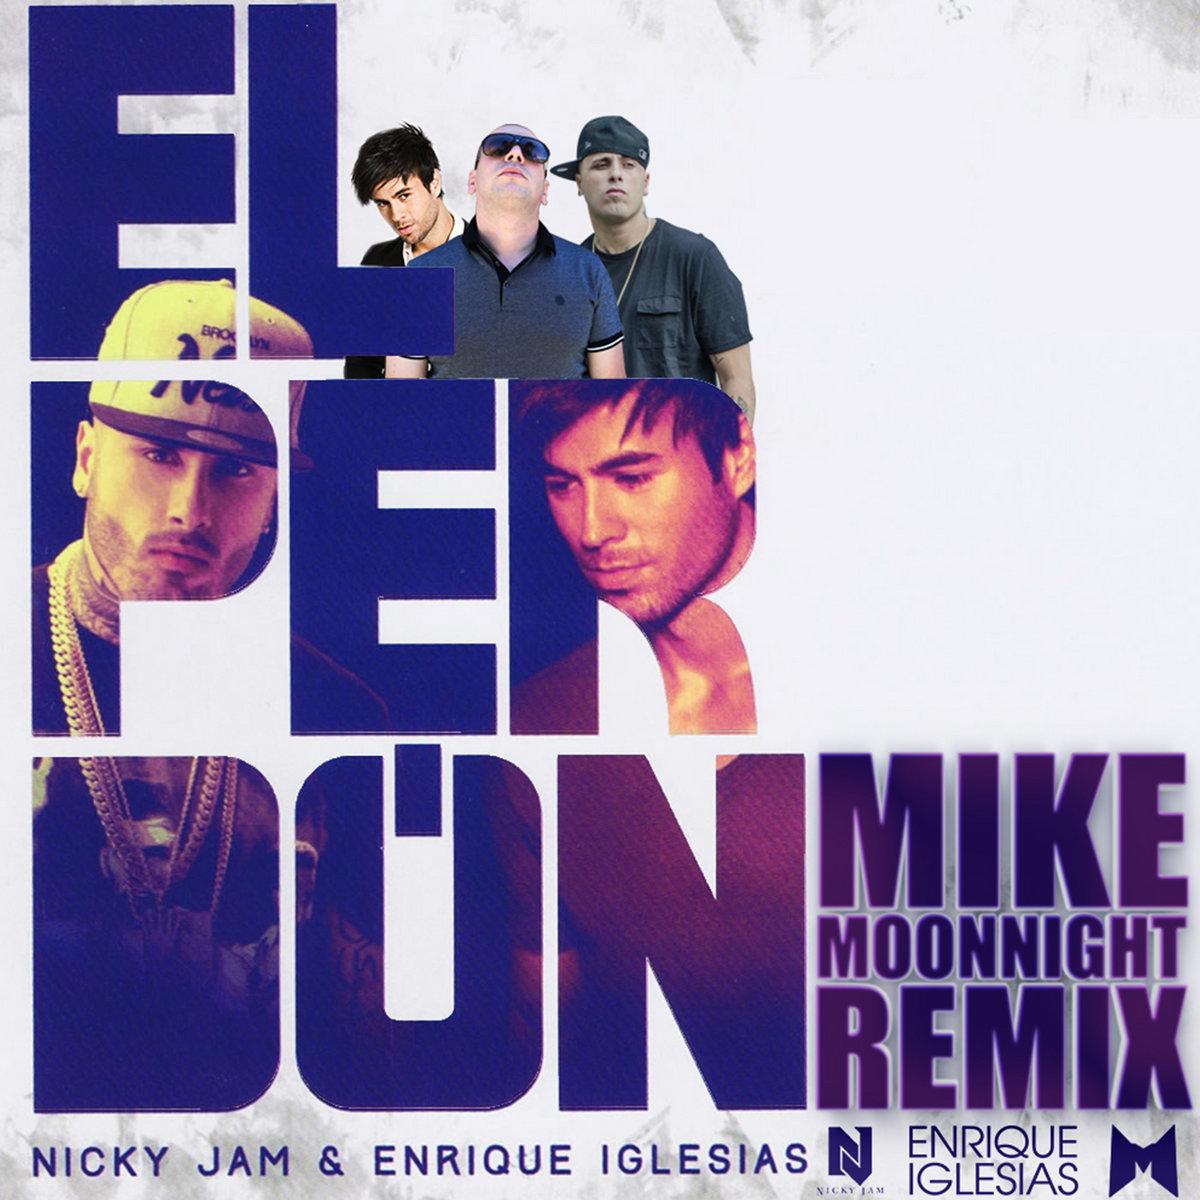 Nicky Jam & Enrique Iglesias - El Perdon (MIKE MOONNIGHT REMIX